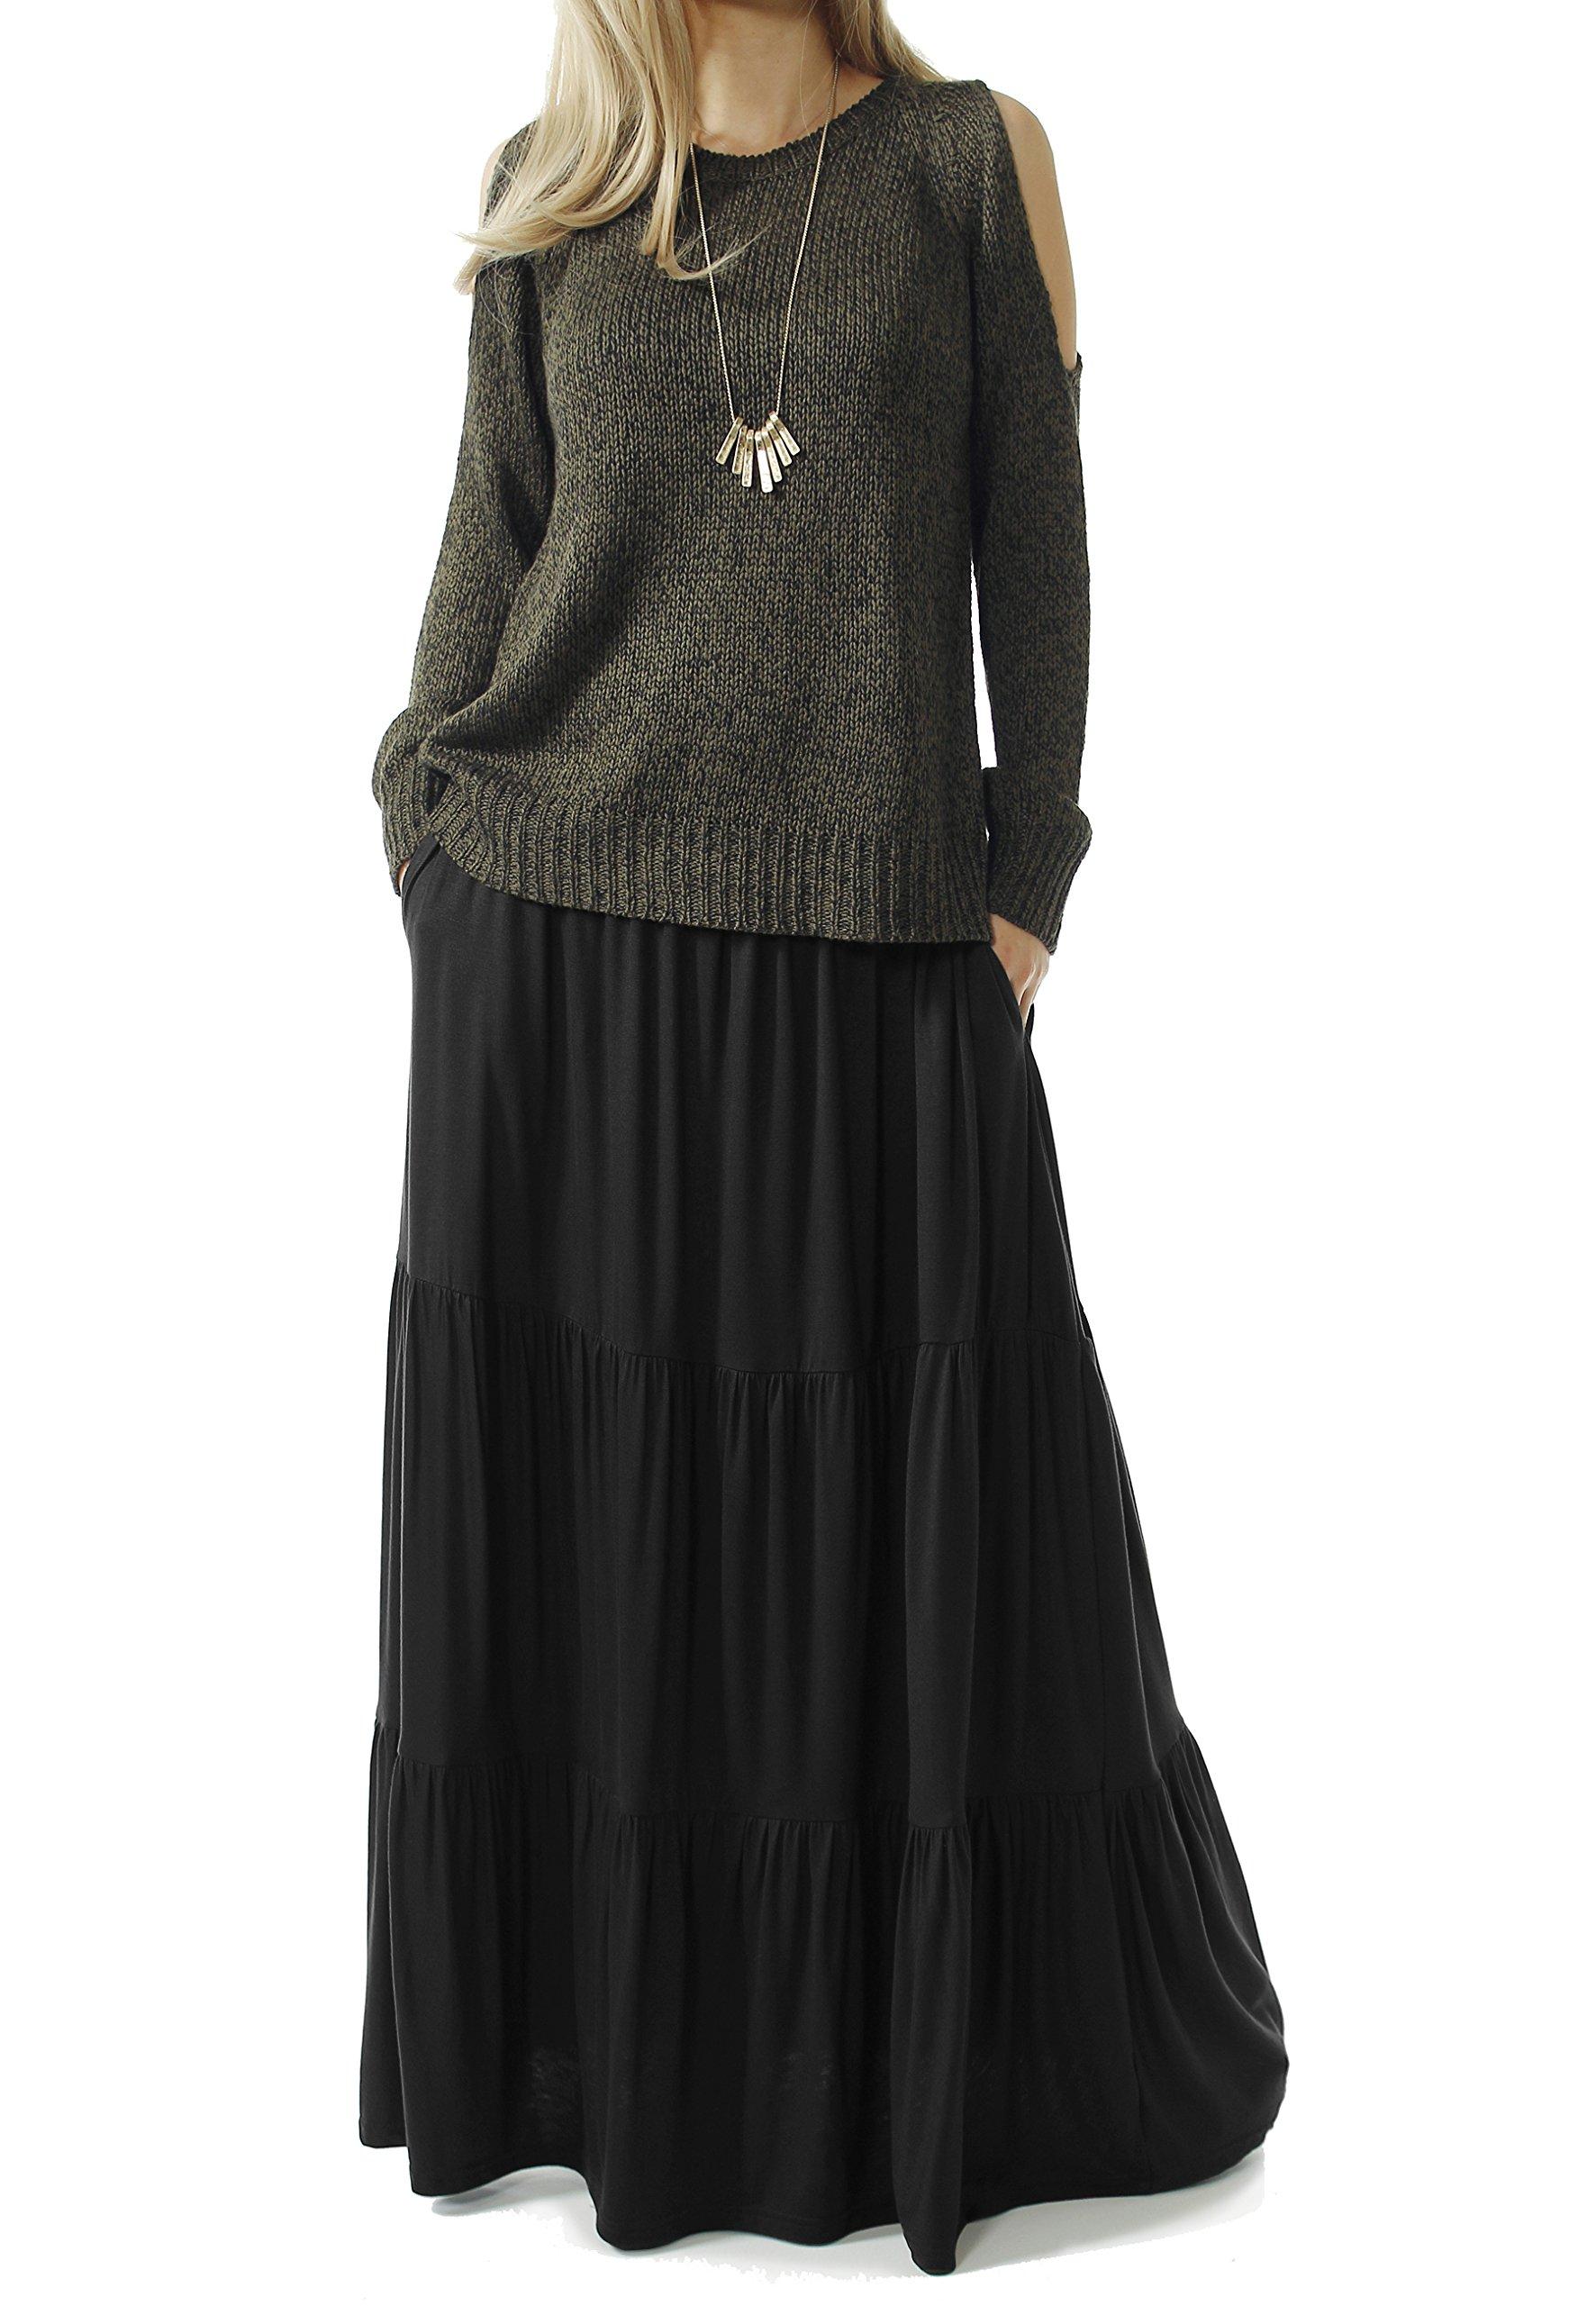 TRENDY UNITED Women's Bohemian Style High Waist Shirring Ruffle Pocket Skirt (S0059-BLK, M)